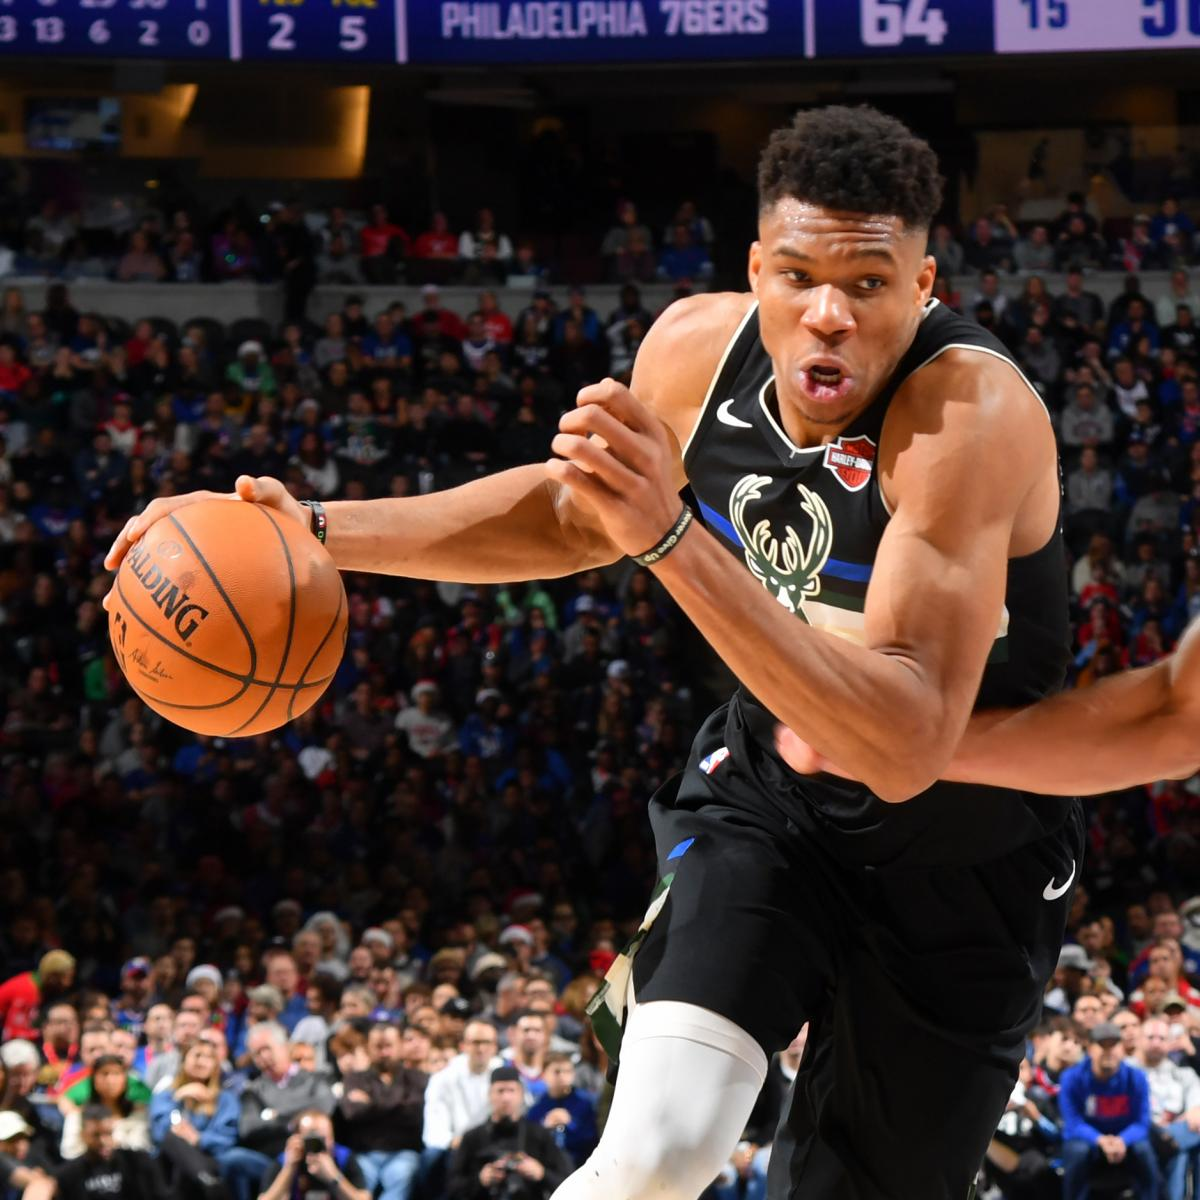 NBA Power Rankings: Does Bucks' Christmas Loss Open Door for a New No. 1?